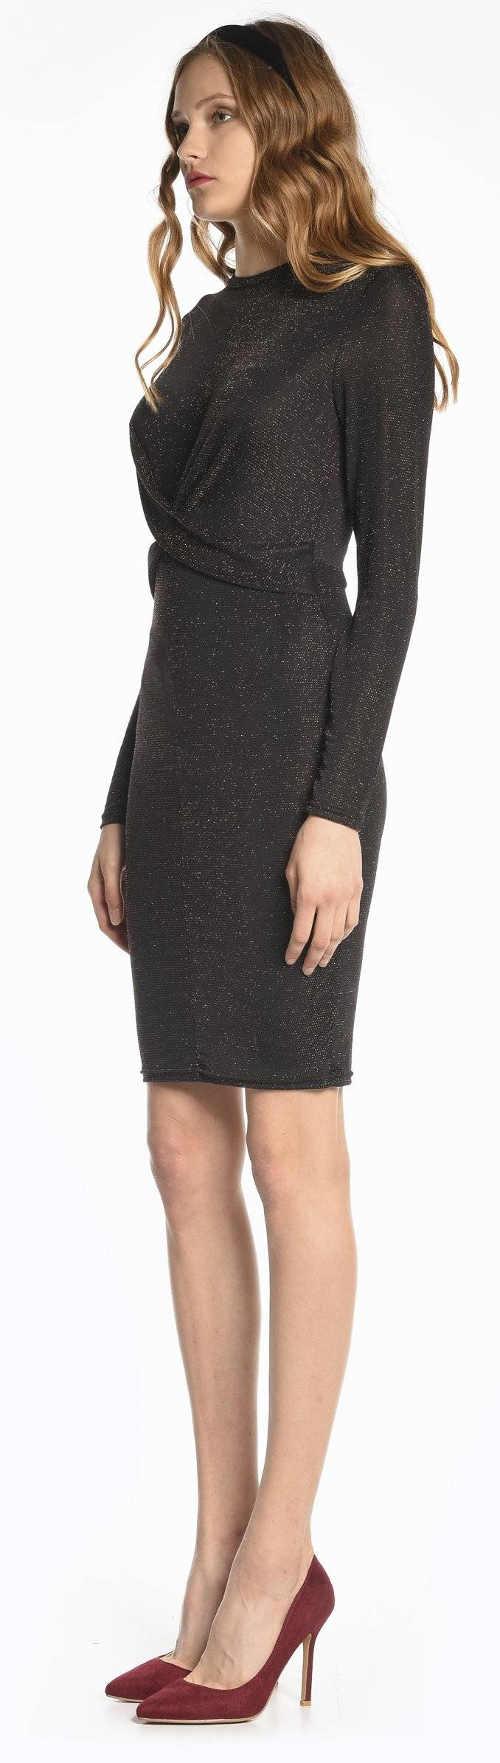 Lacné elegantné dámske šaty čierne